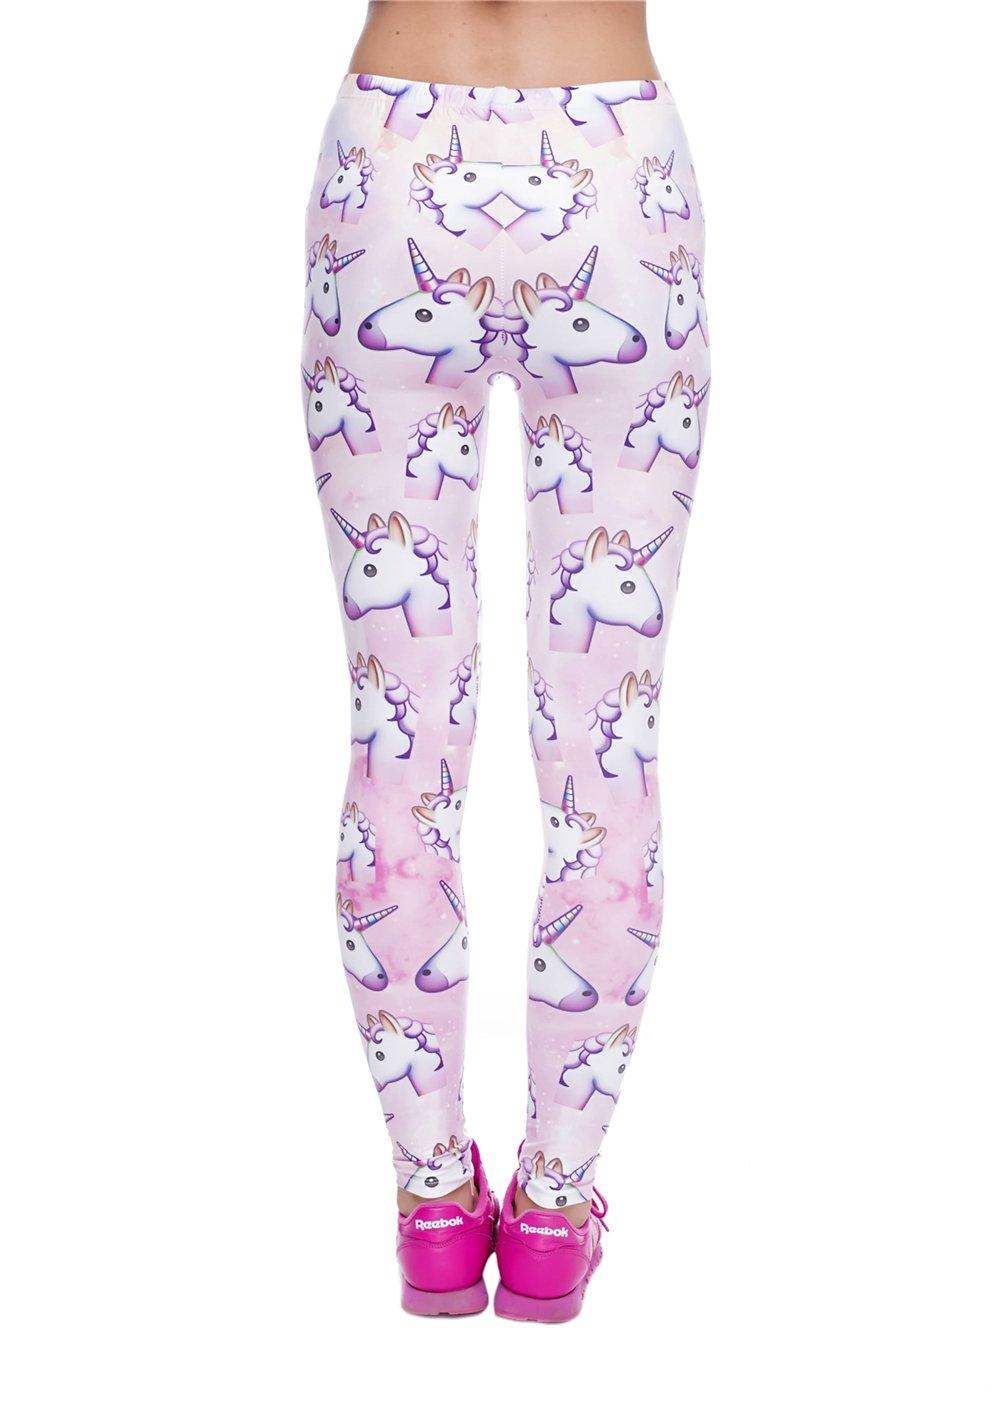 Smallbox Femmes Leggings Pink 3D imprim/é Belle Mode Licorne Leggings pour Gym Sport Yoga